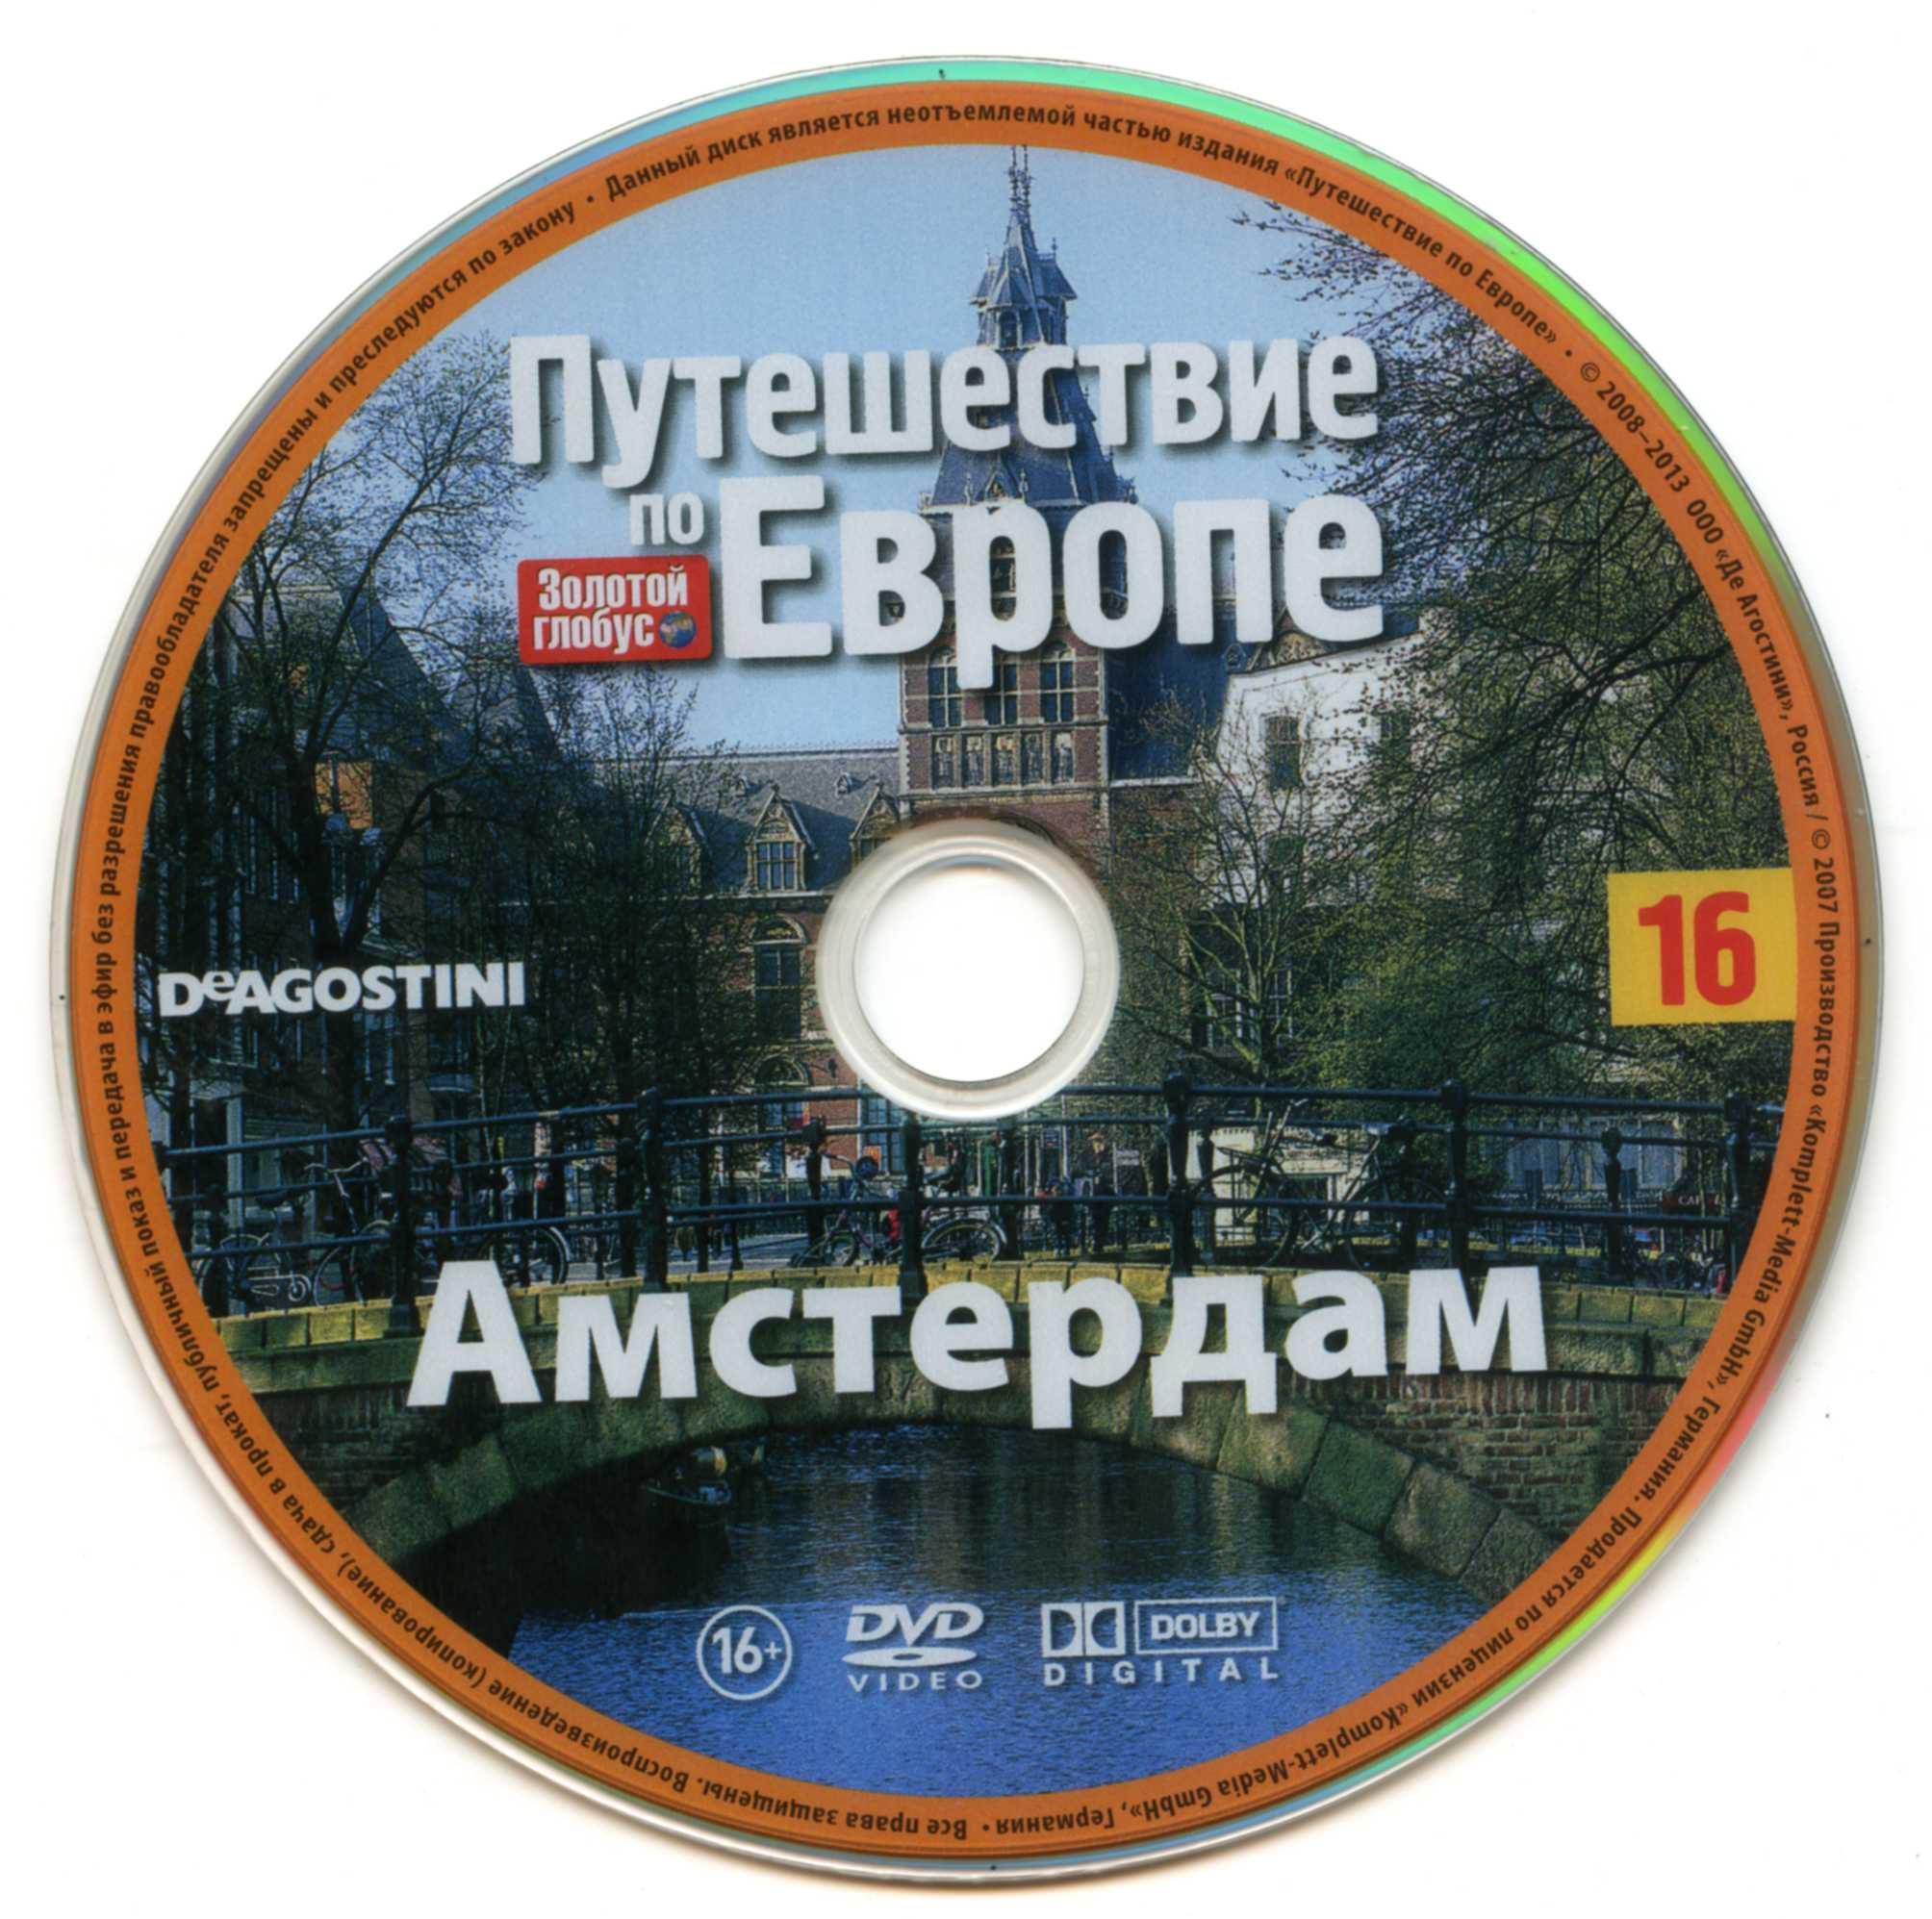 http://i4.imageban.ru/out/2013/05/20/8cf34b62d18f8d49436a279c2a883f4e.jpg